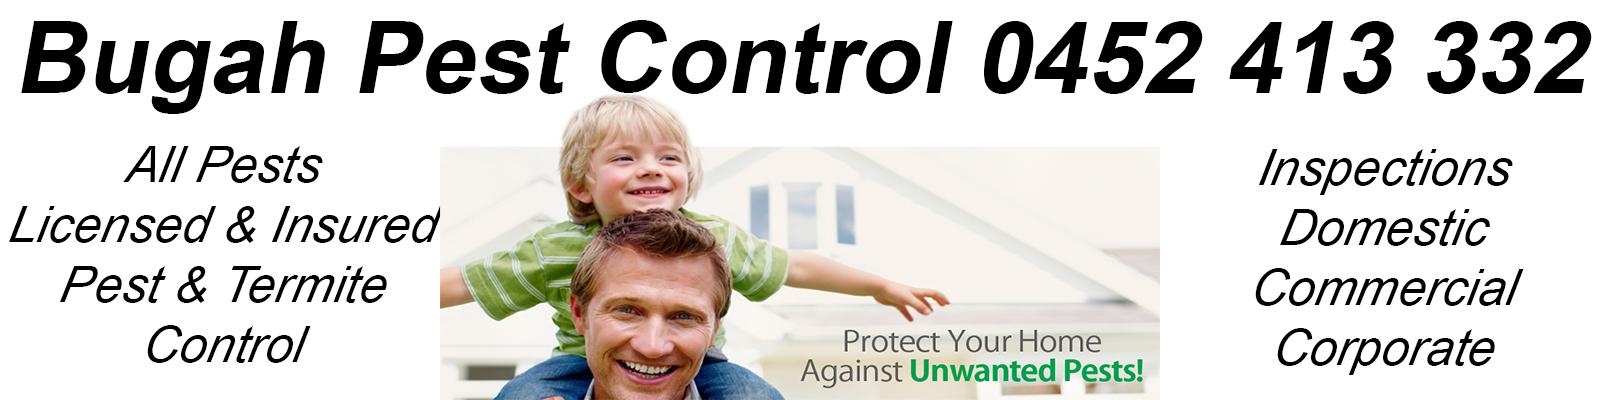 Residential Pest Control Central Coast Newcastle Book Pest Control